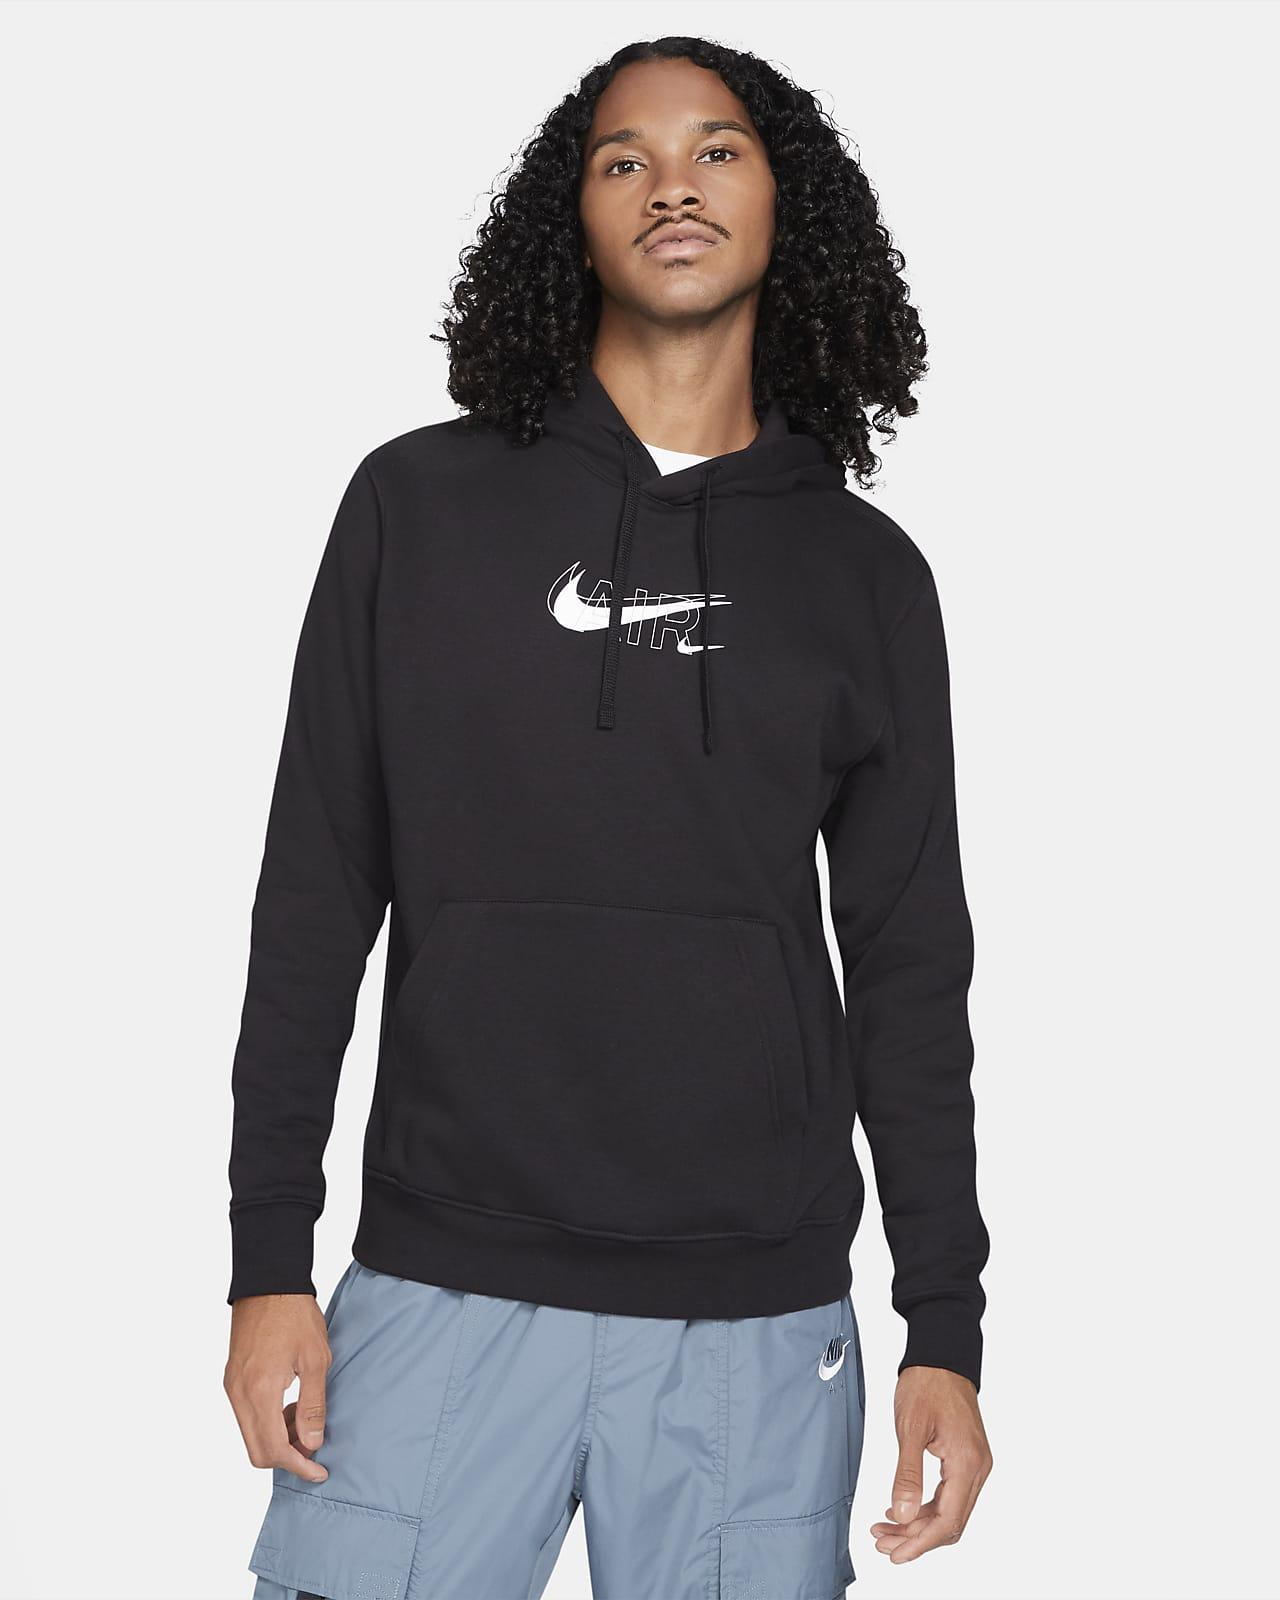 Hoodies » Nike Sportswear von Nike in grau im Online Shop